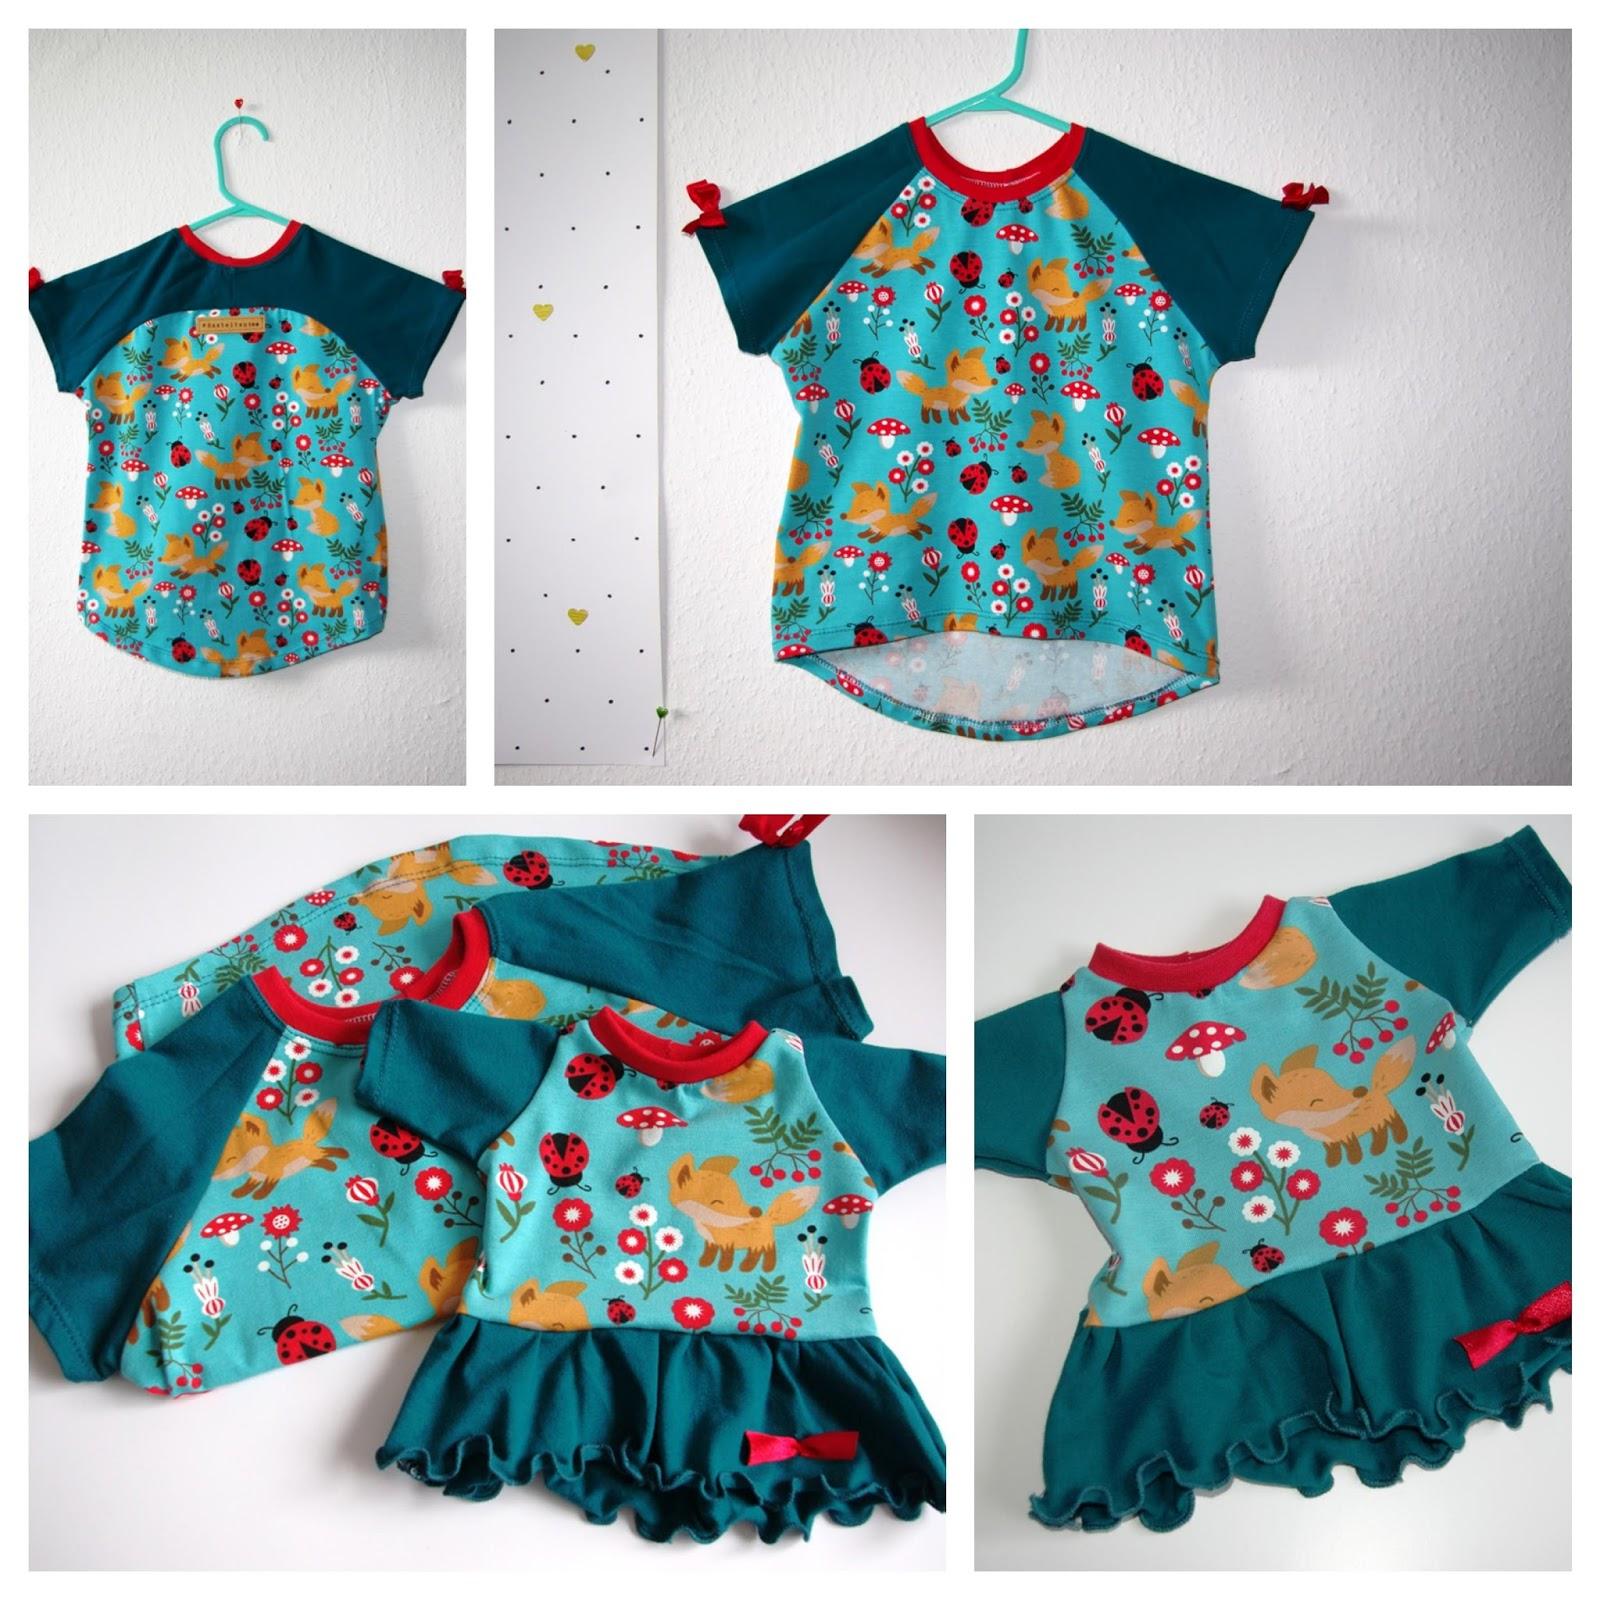 Collage Bethioua Mini von Ellepuls - Nähblog Kinder Shirt selber nähen Freebook